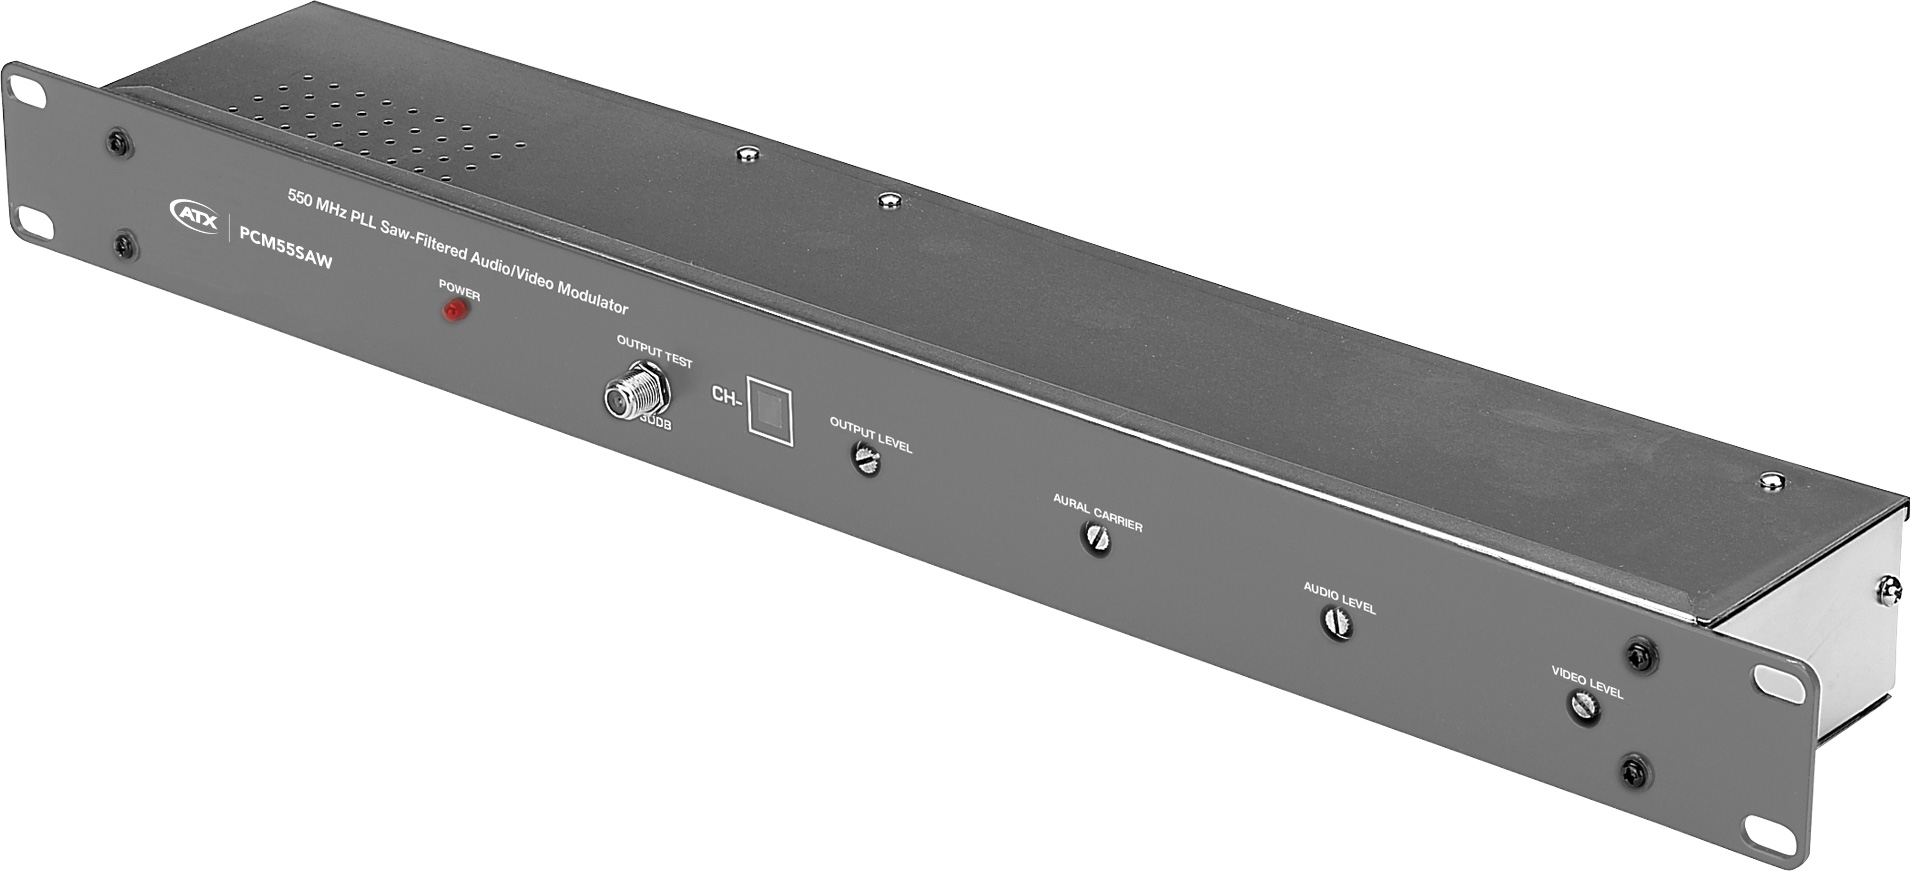 1 Channel Crystal A/V Modulator - Channel 11 PM-PCM55SAW-11